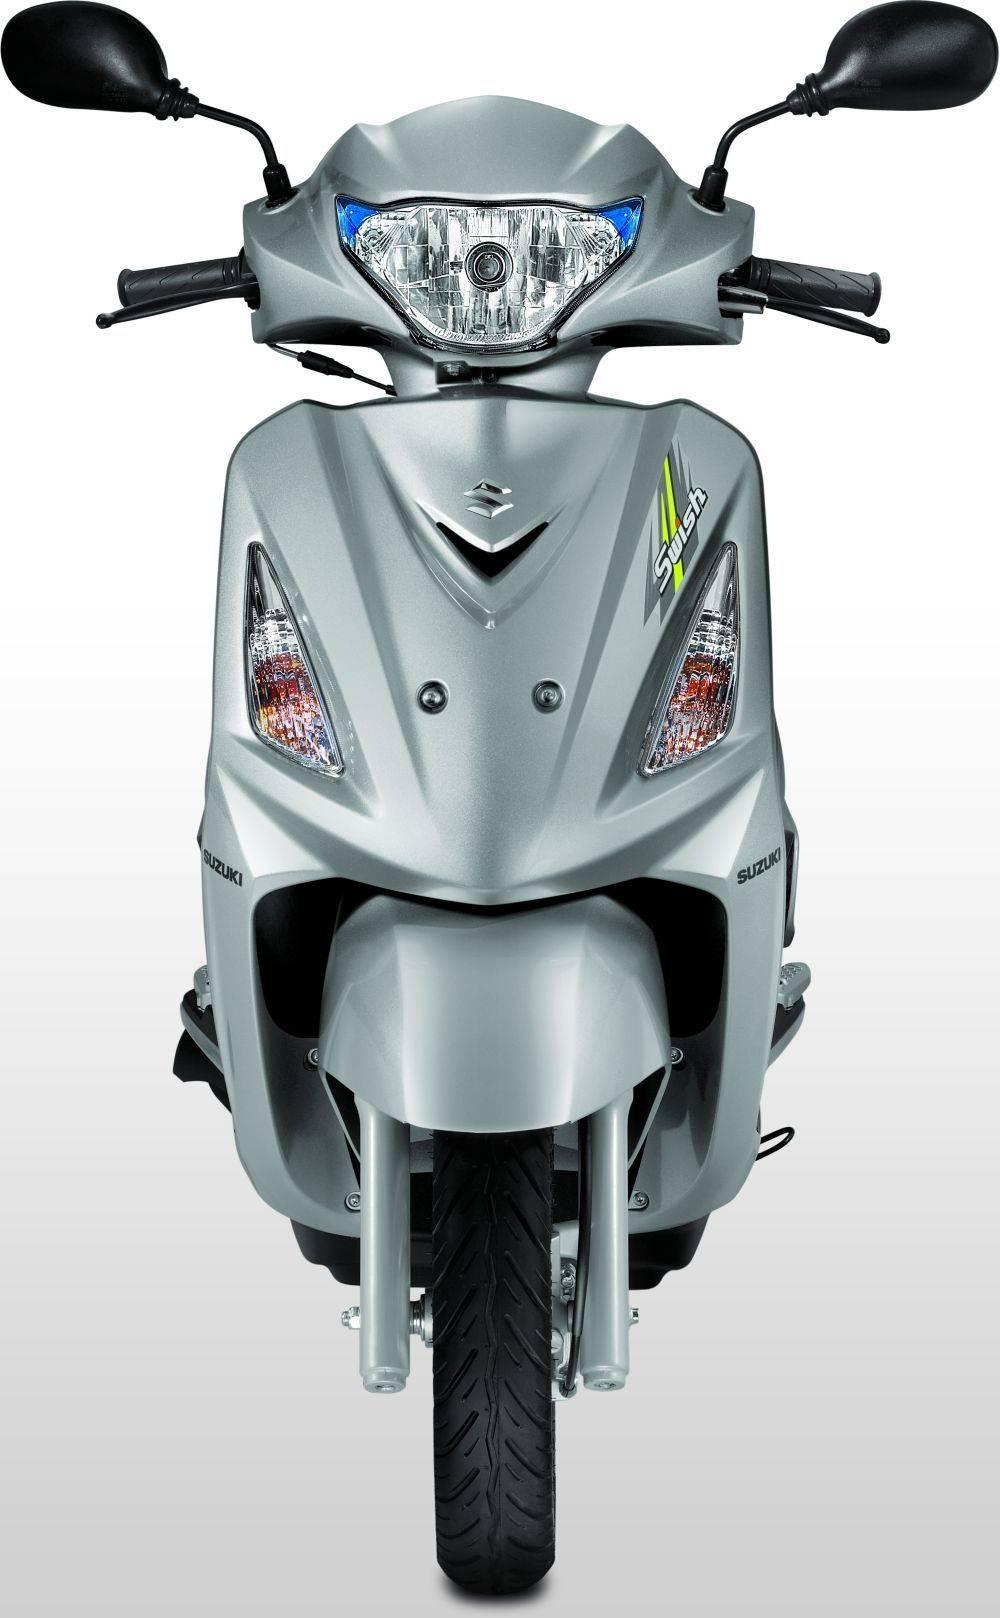 Suzuki Swish 125 Price, Mileage, Review - Suzuki Bikes